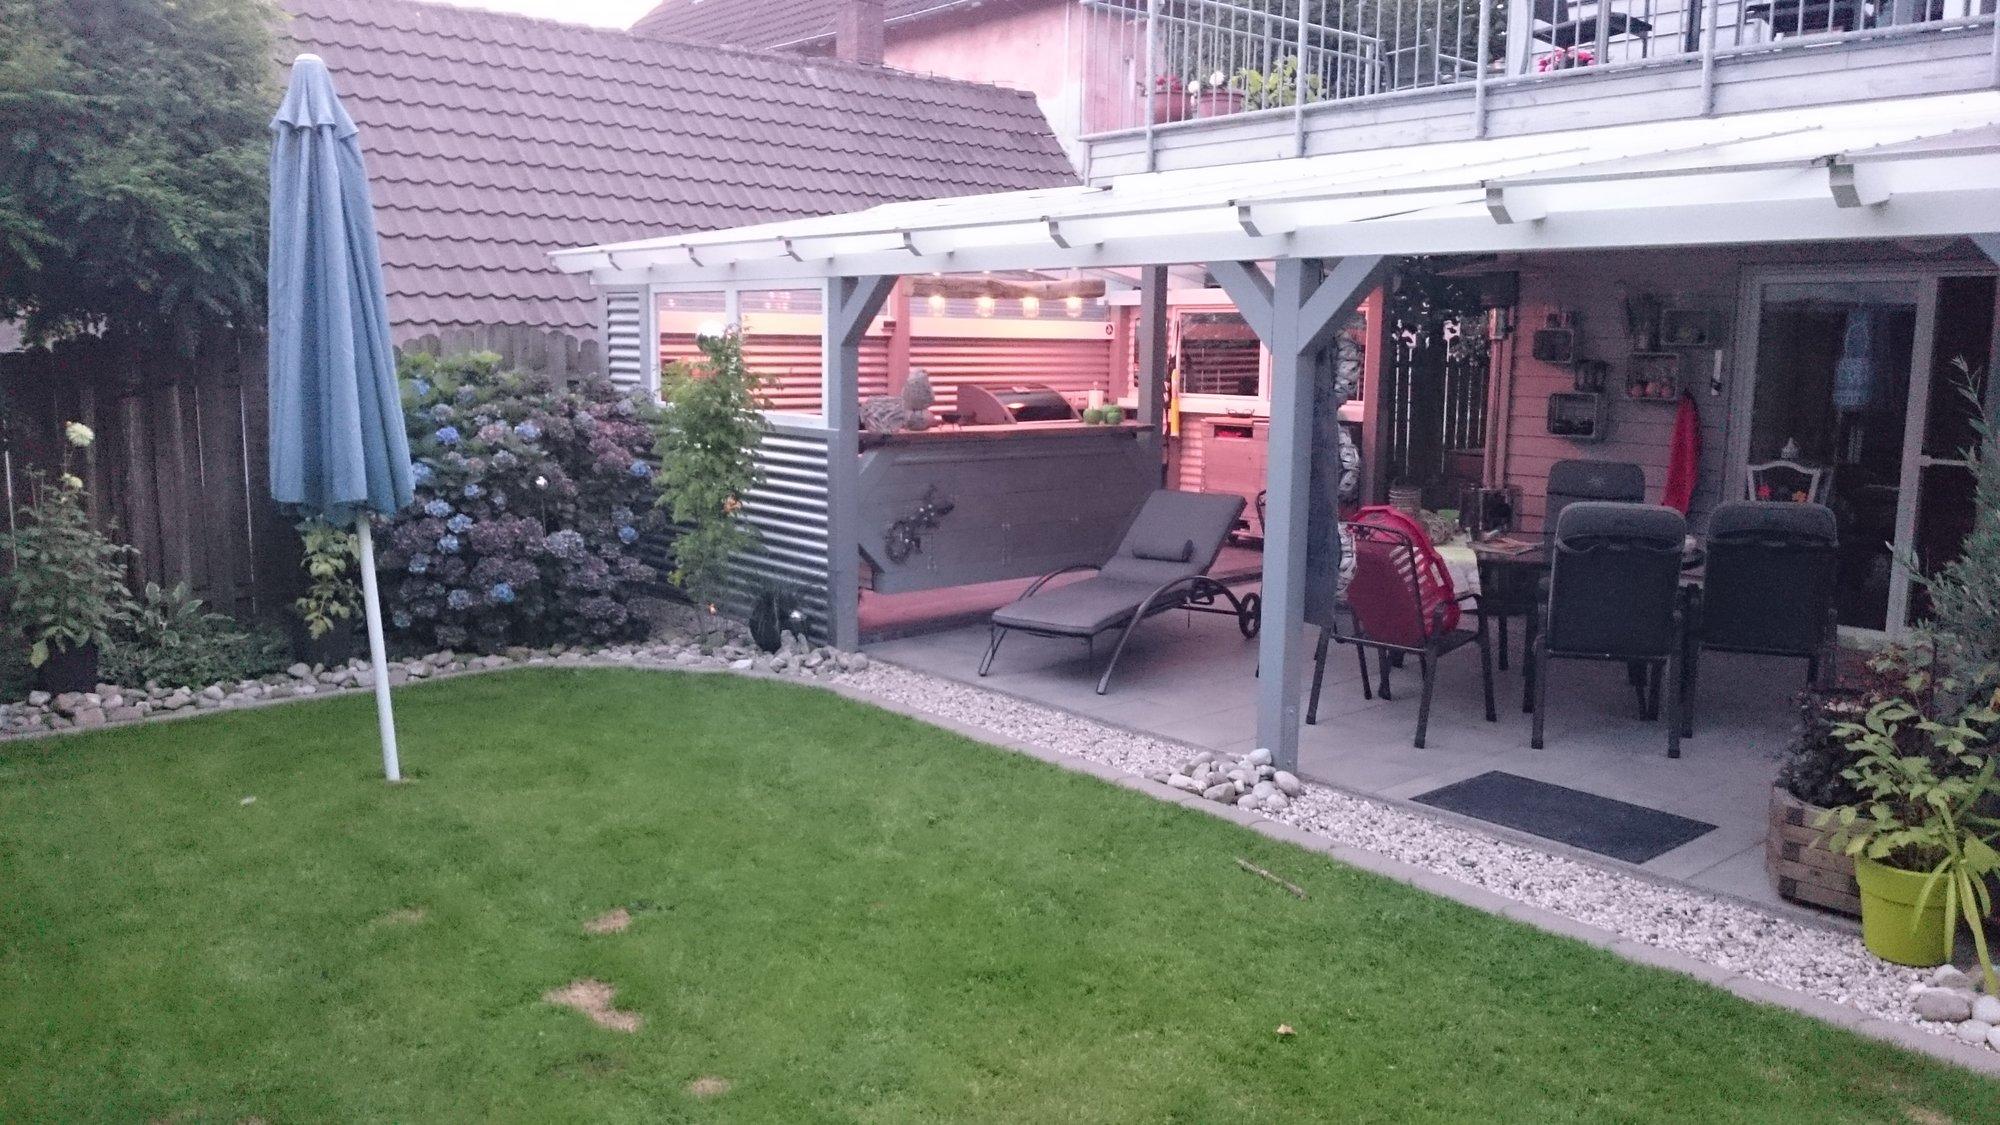 Outdoorküche Garten Edelstahl Unterschied : Outdoor küche edelstahl unterschied die outdoorküche u